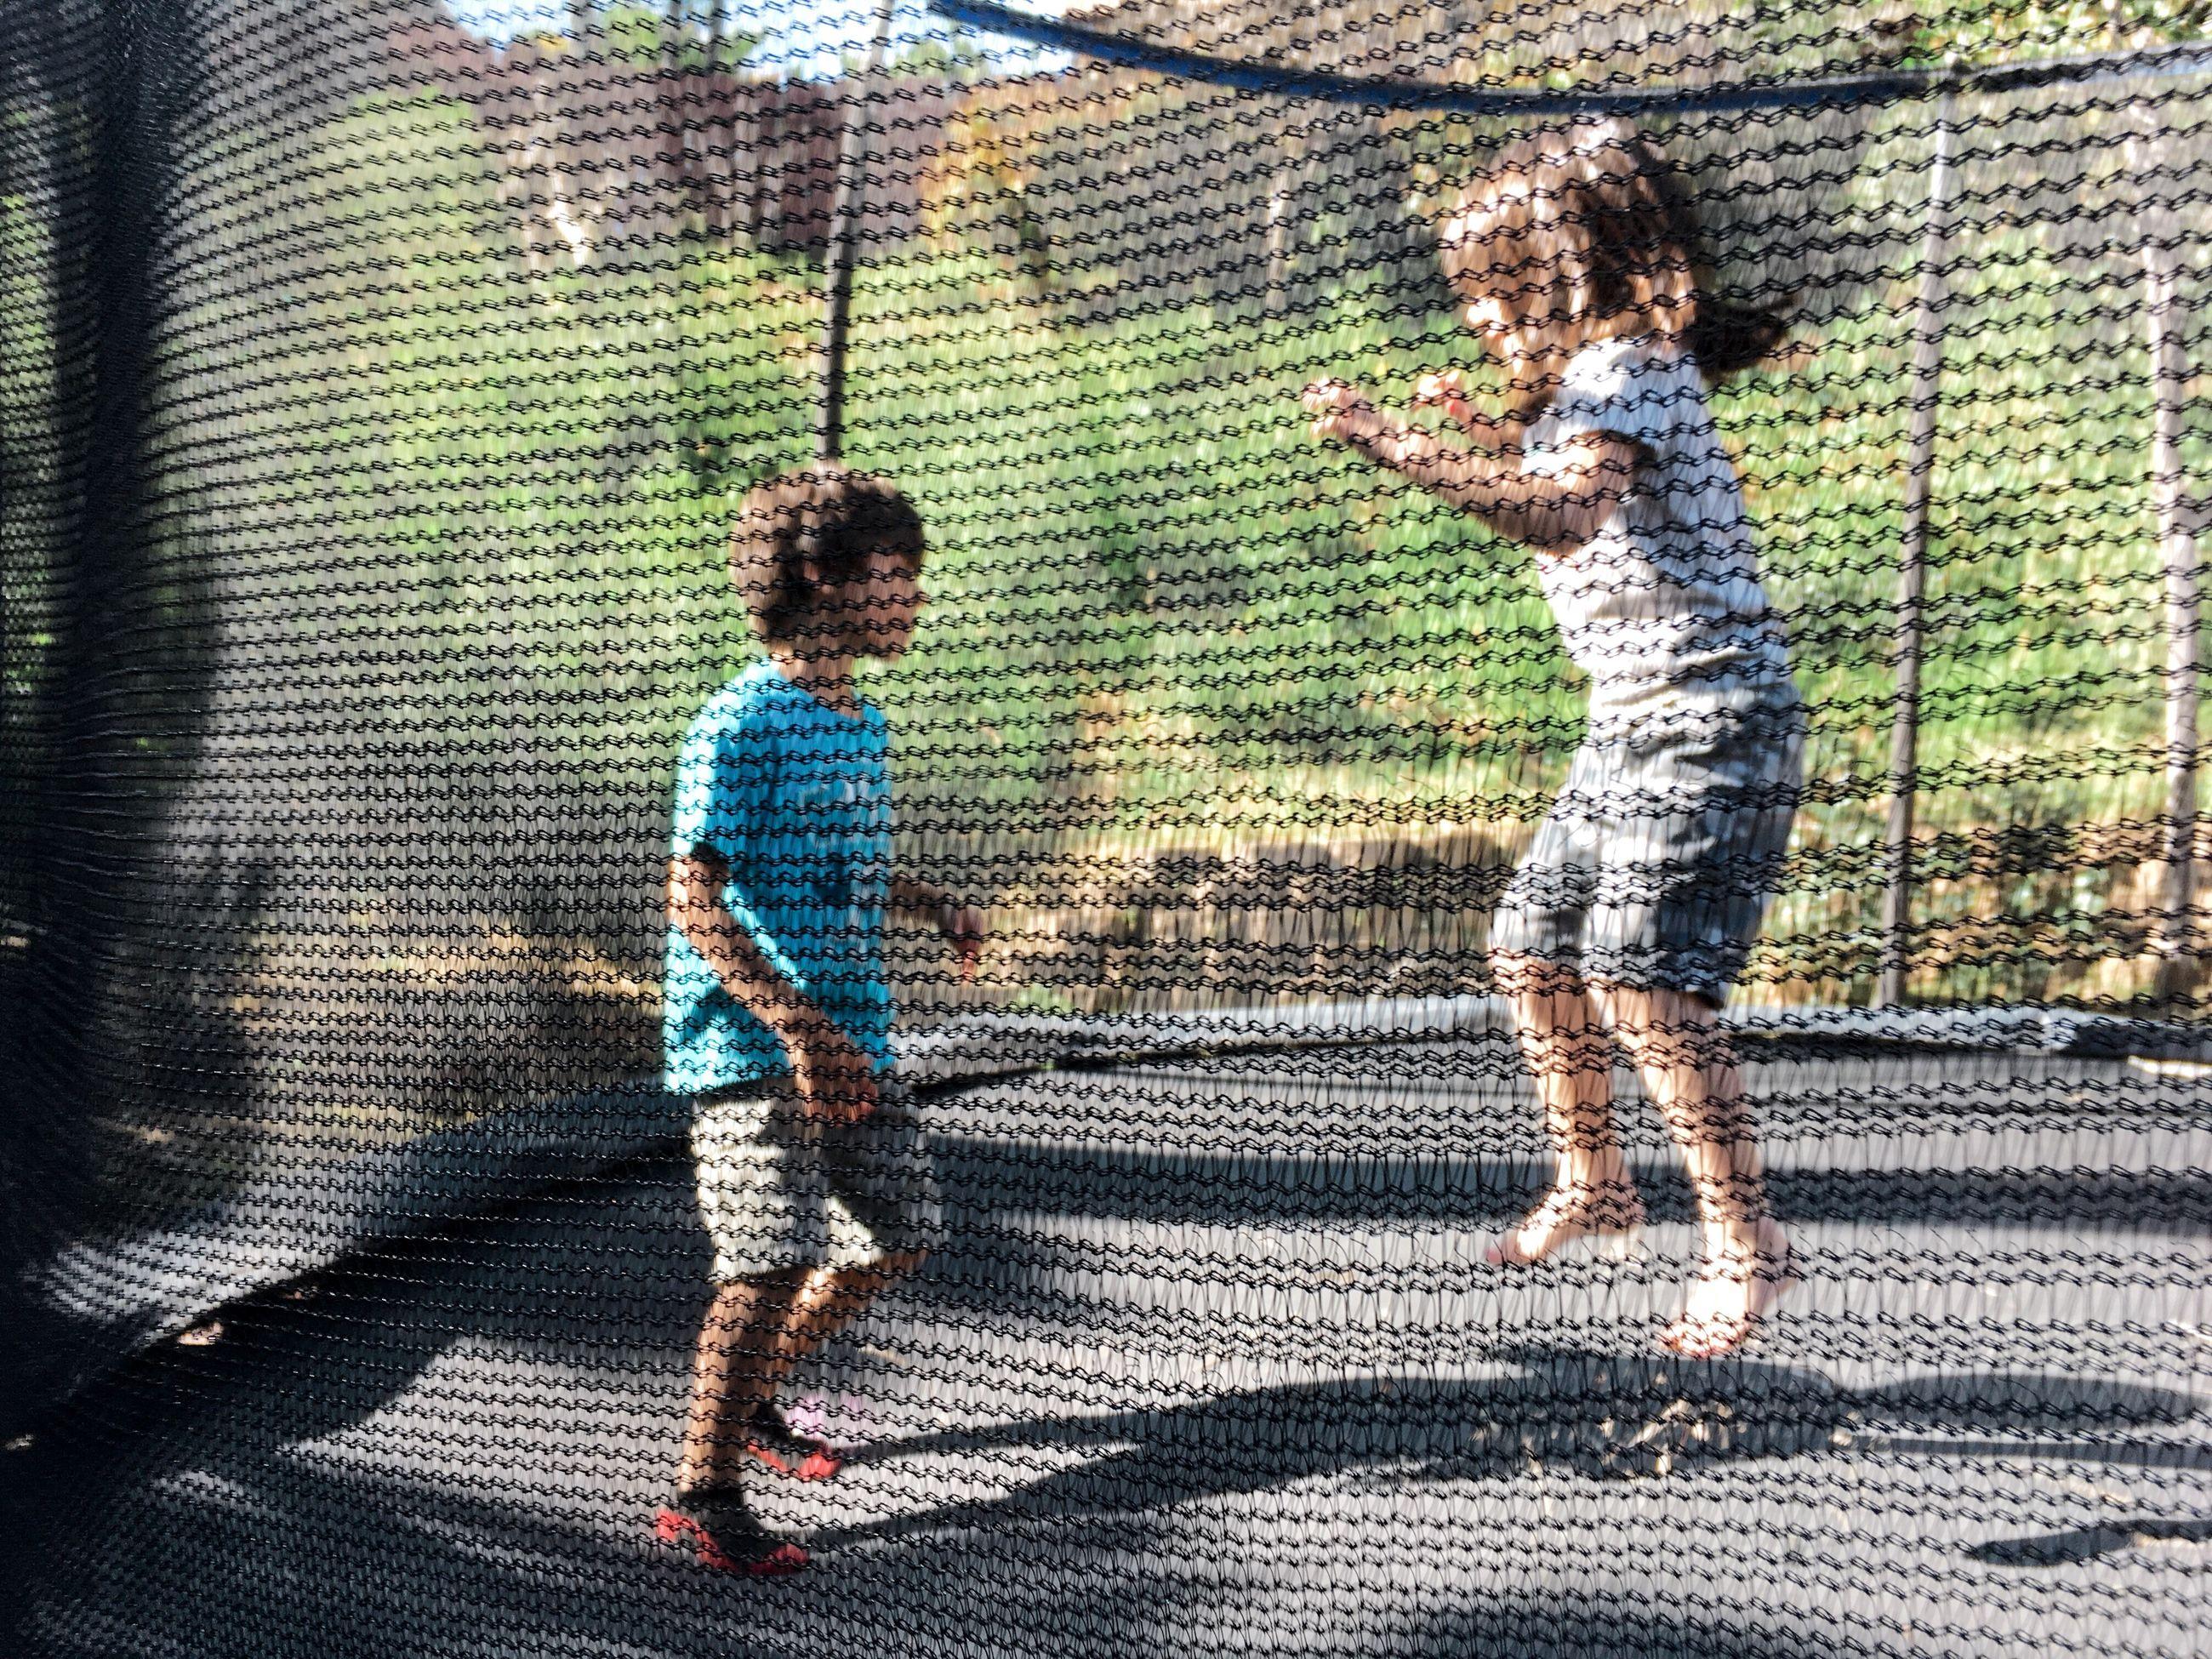 Children playing in trampoline